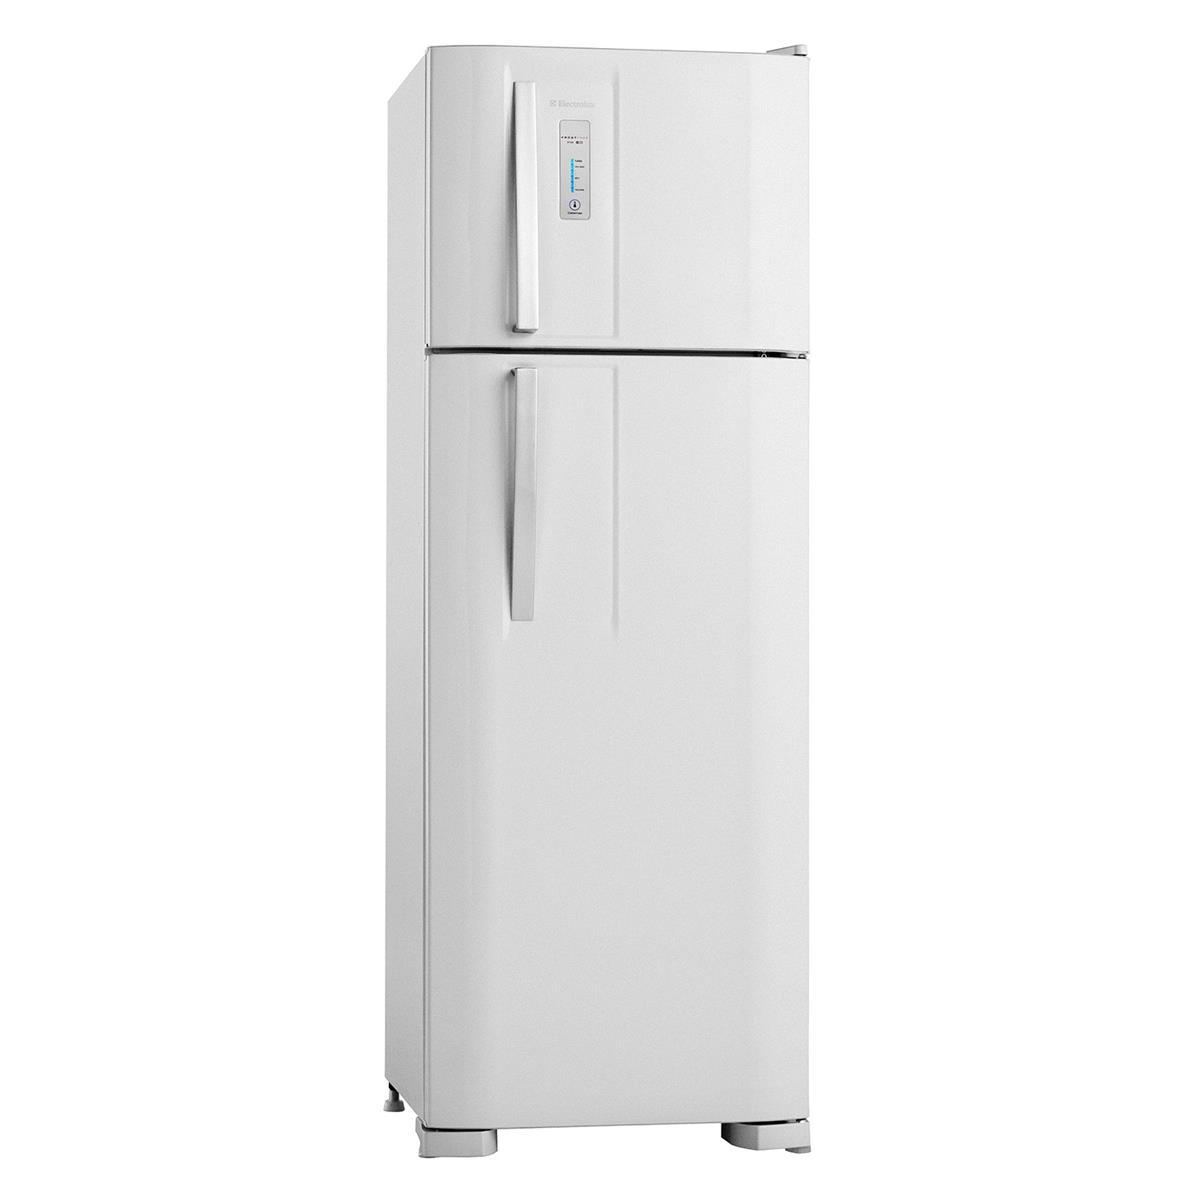 Geladeira Frost Free 2 Portas 310L Branco Df36a Electrolux